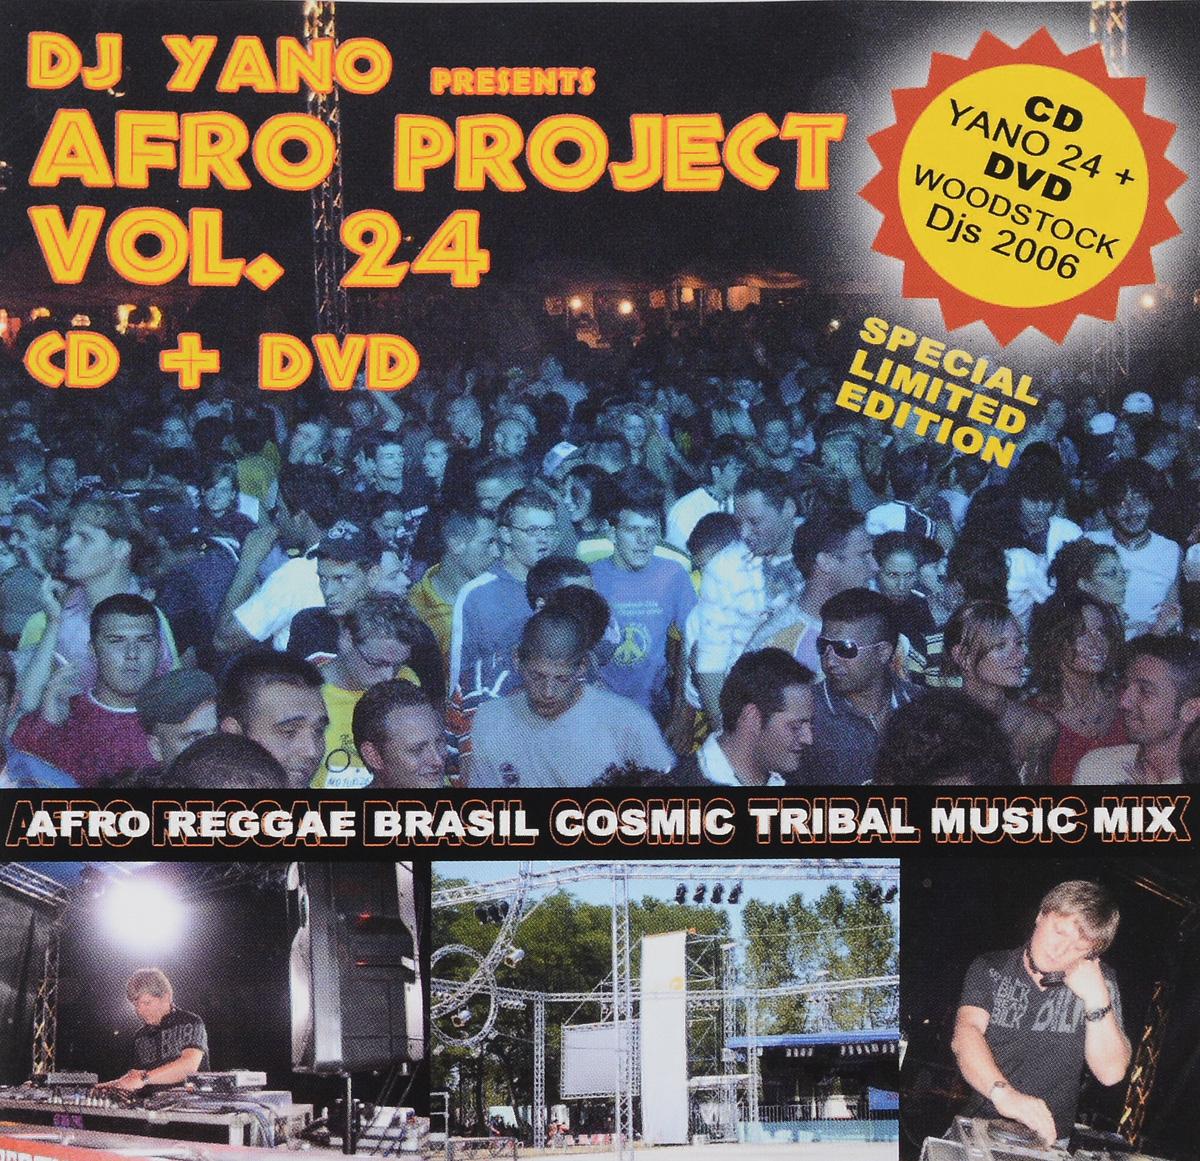 Dj Yano Dj Yano. Afro Project. Vol. 24. Special Limited Edition (CD + DVD)